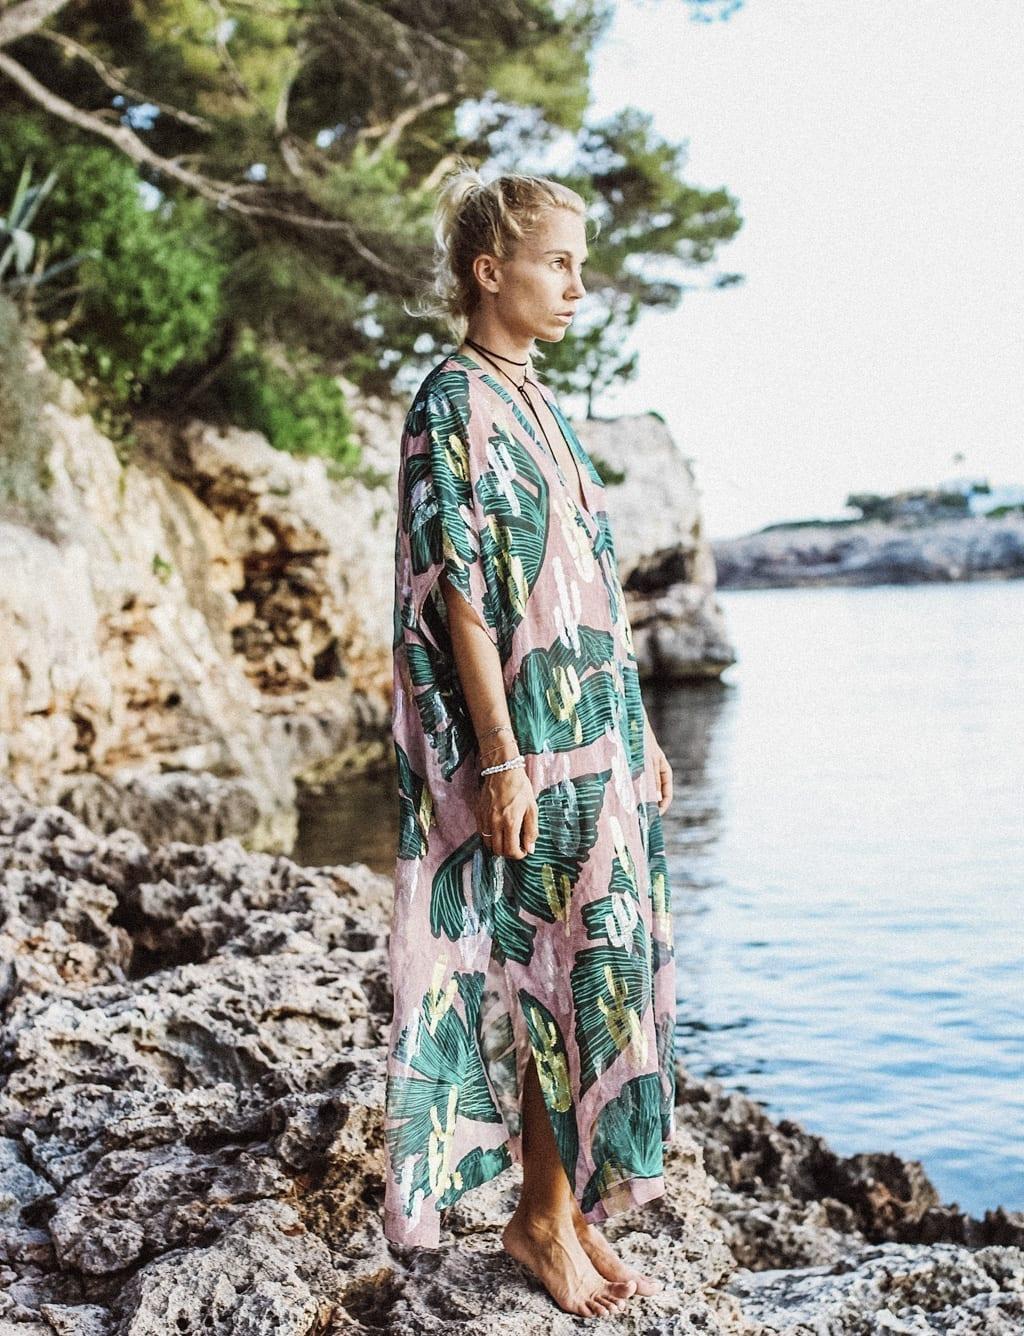 CK-1606-Mallorca-Island-Spain-Luxury-Holiday-Blogger-Beach-Outfit-Style-Fashion-Baleares-1251